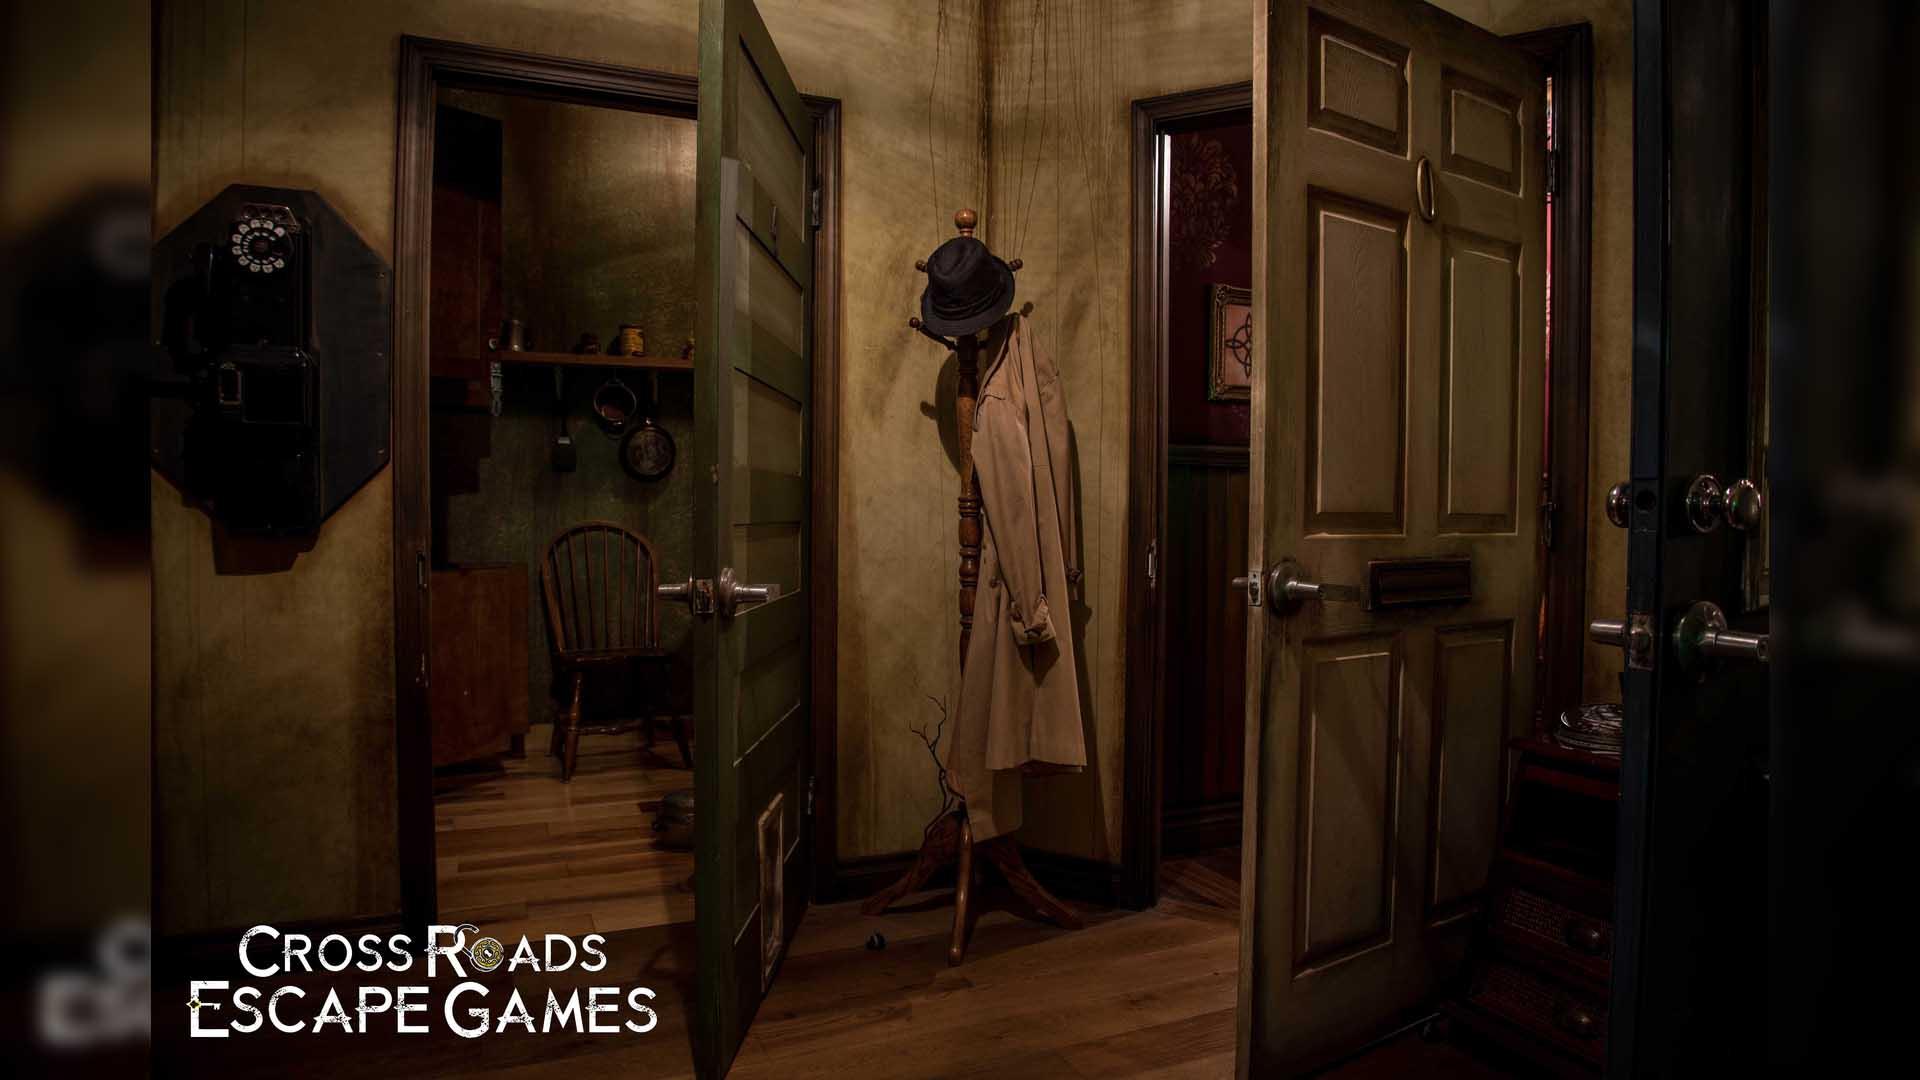 (Image courtesy of Cross Roads Escape Games.)